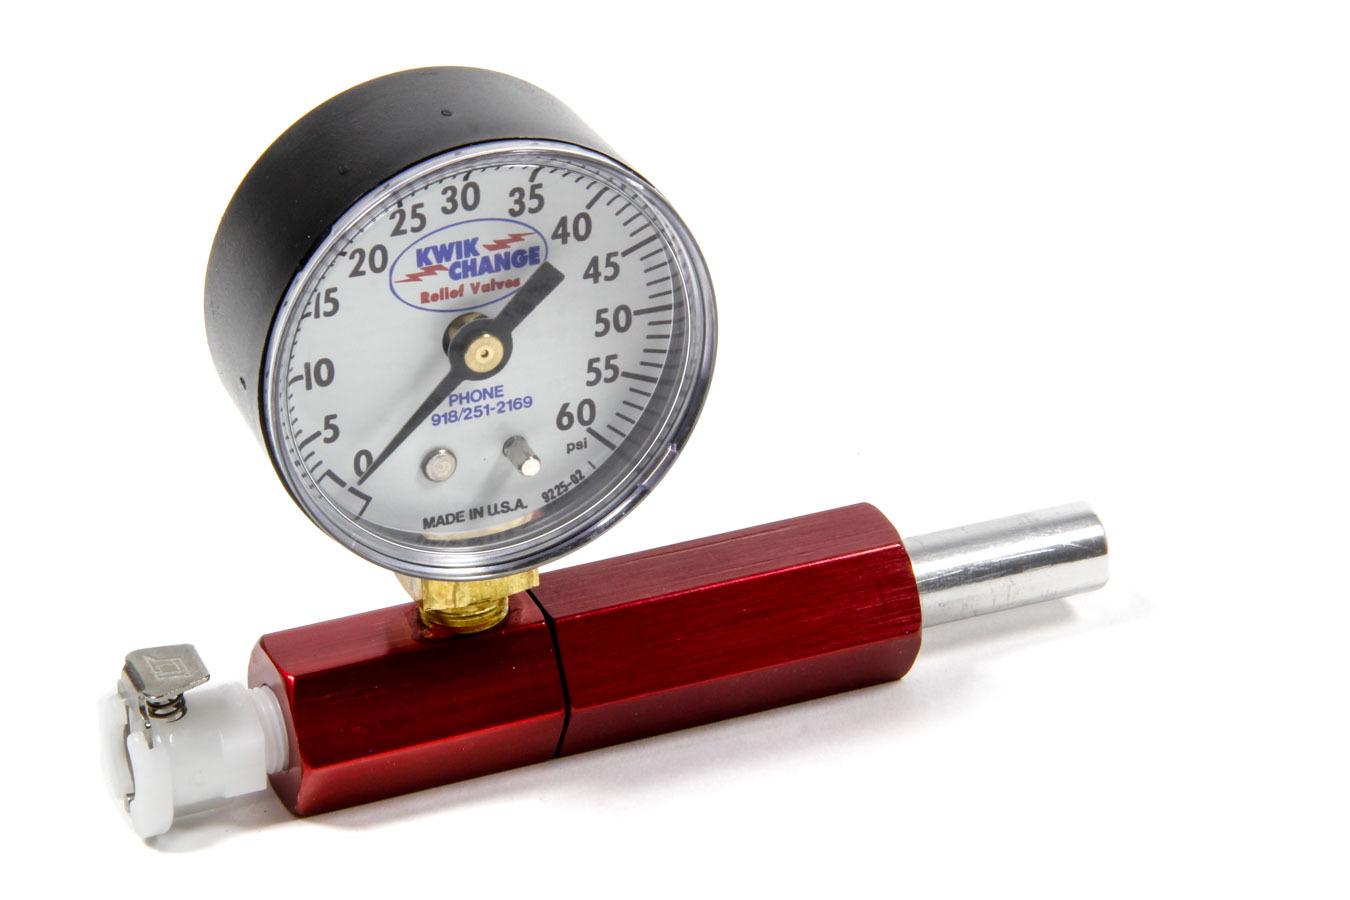 Kwik Change Products 60# Pre-Set Pump